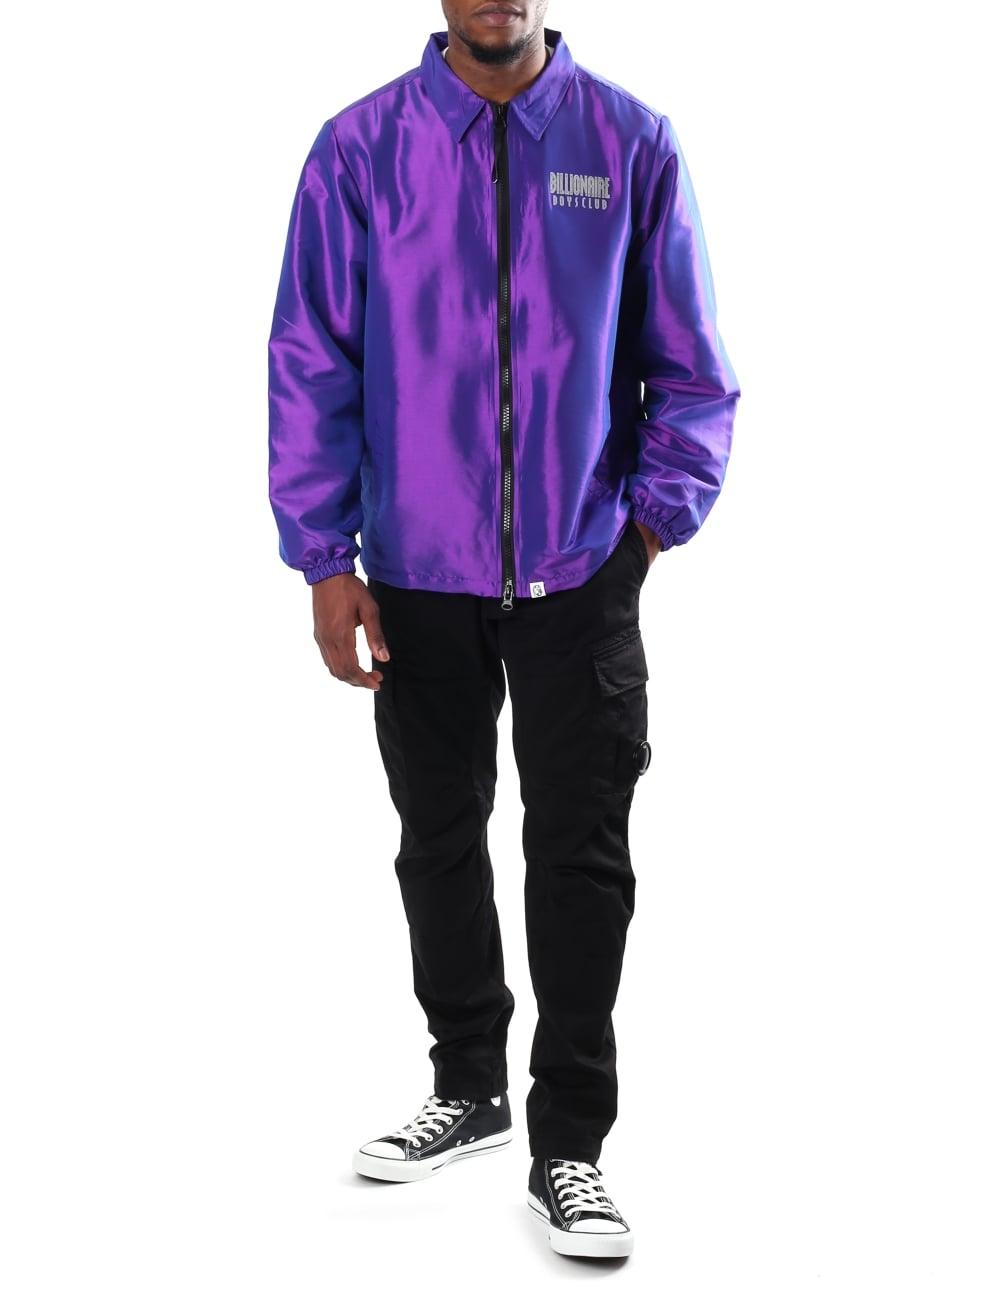 8528548c85cb Billionaire Boys Club Men s Iridescent Zip Jacket